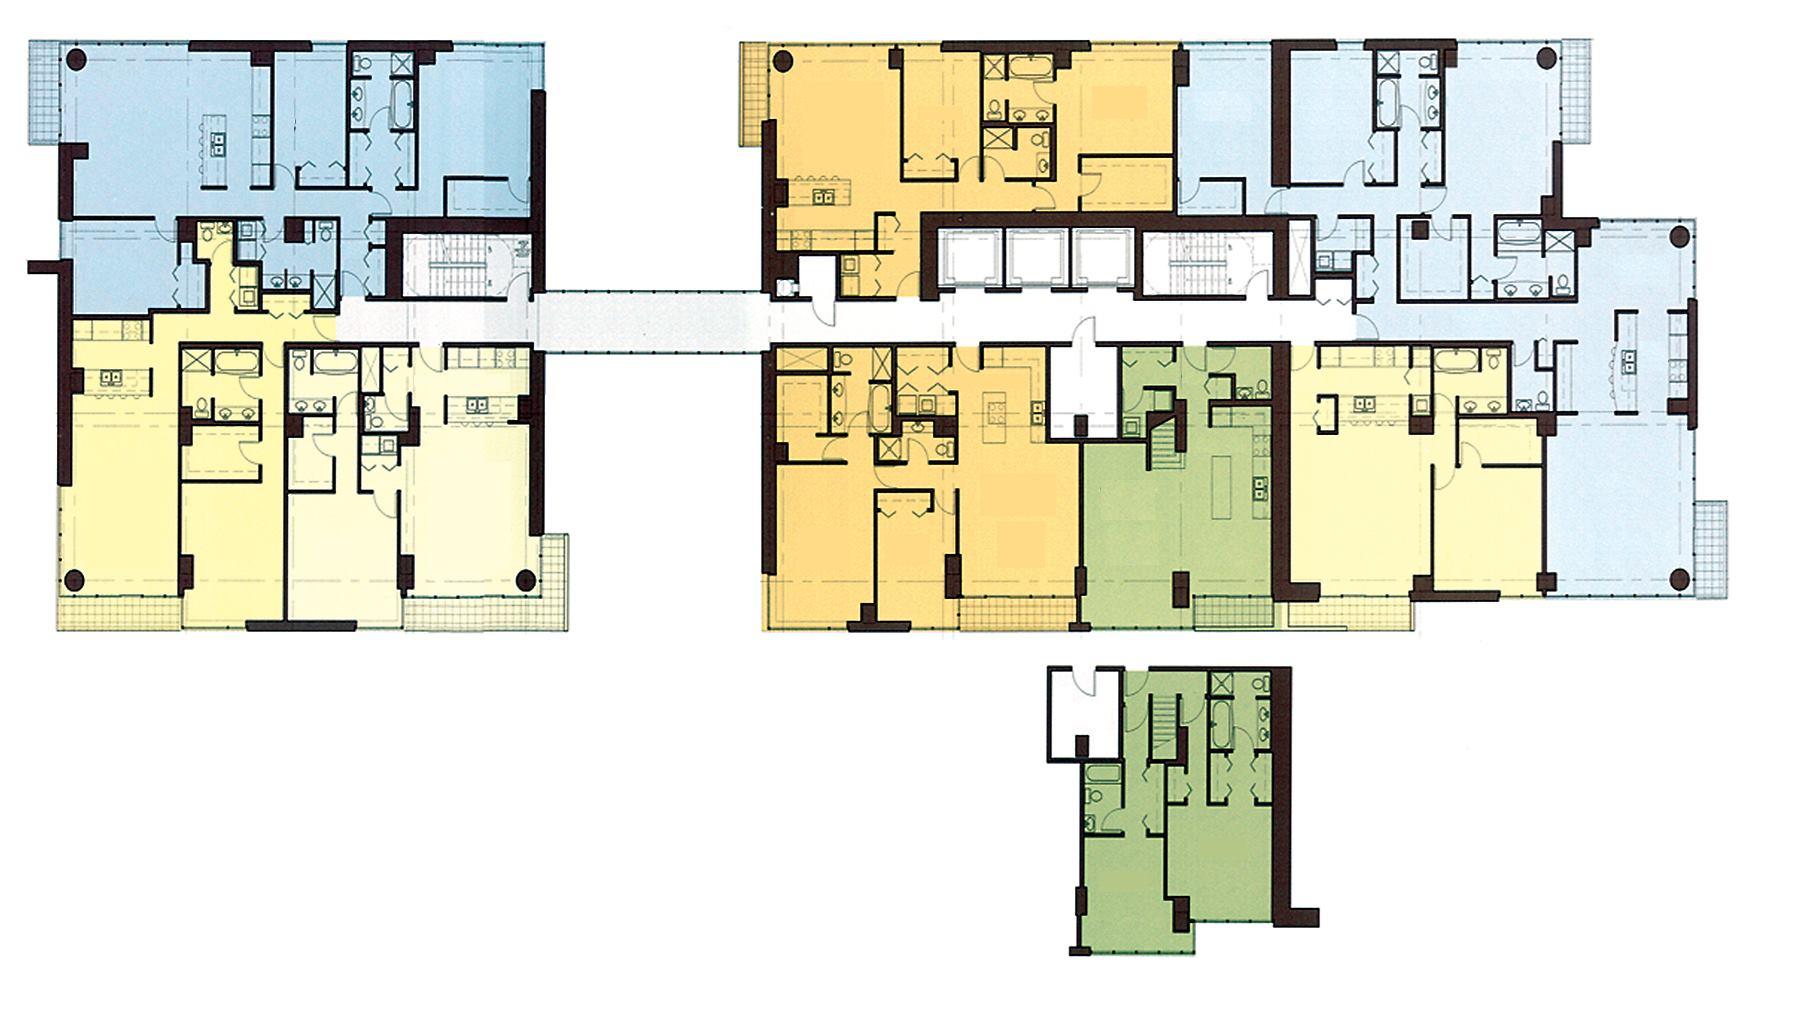 Skybridge chicago residential architect multifamily for Residential architect design awards